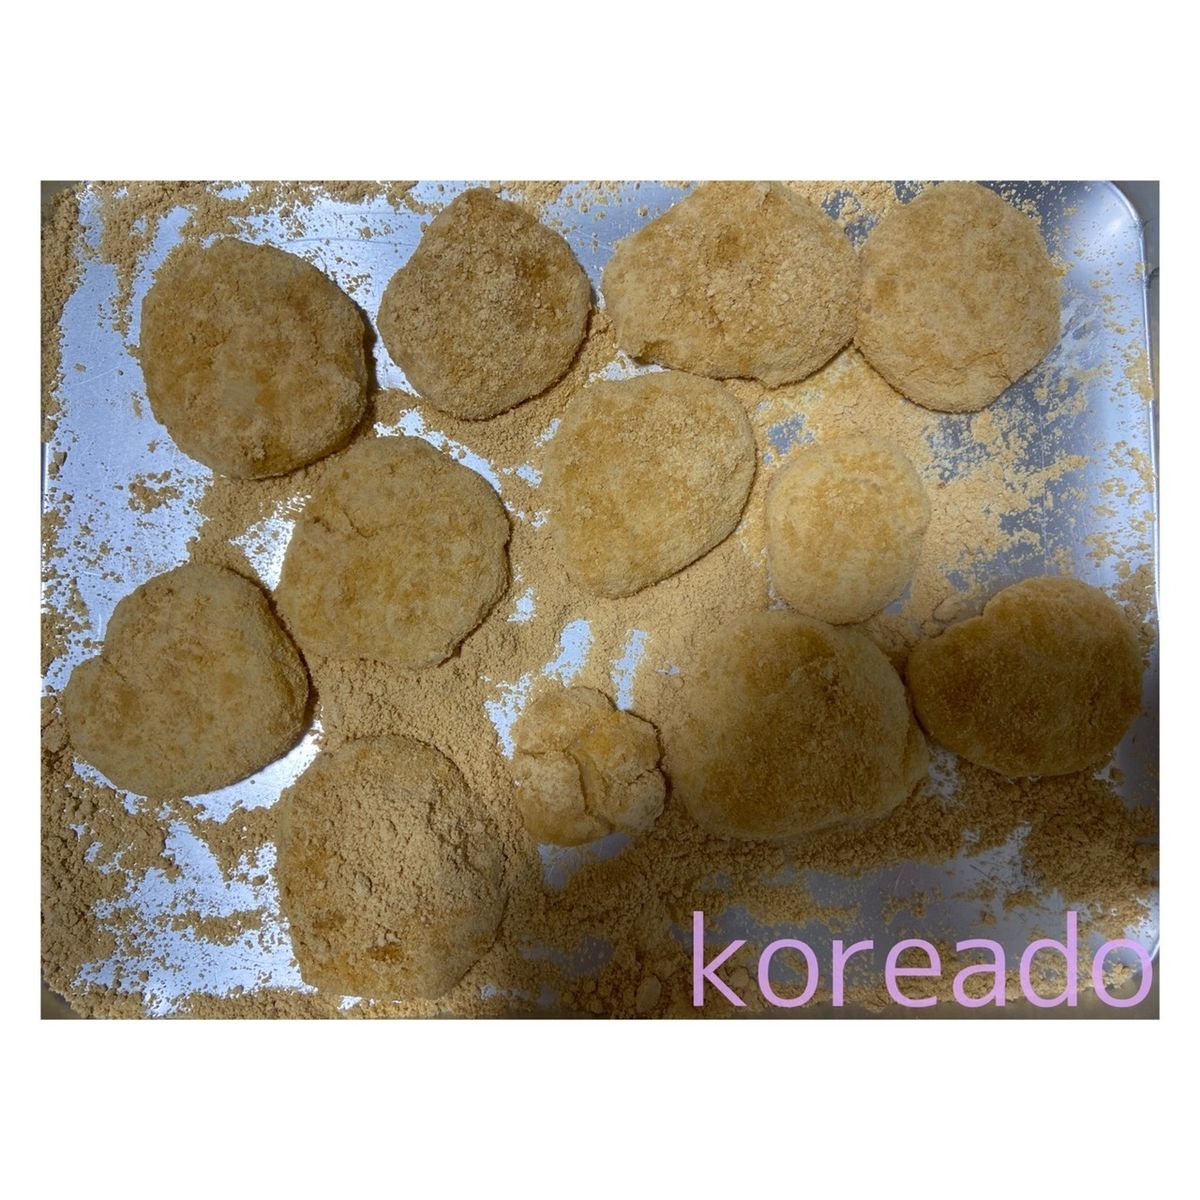 f:id:i-love-korea:20200802222338j:plain